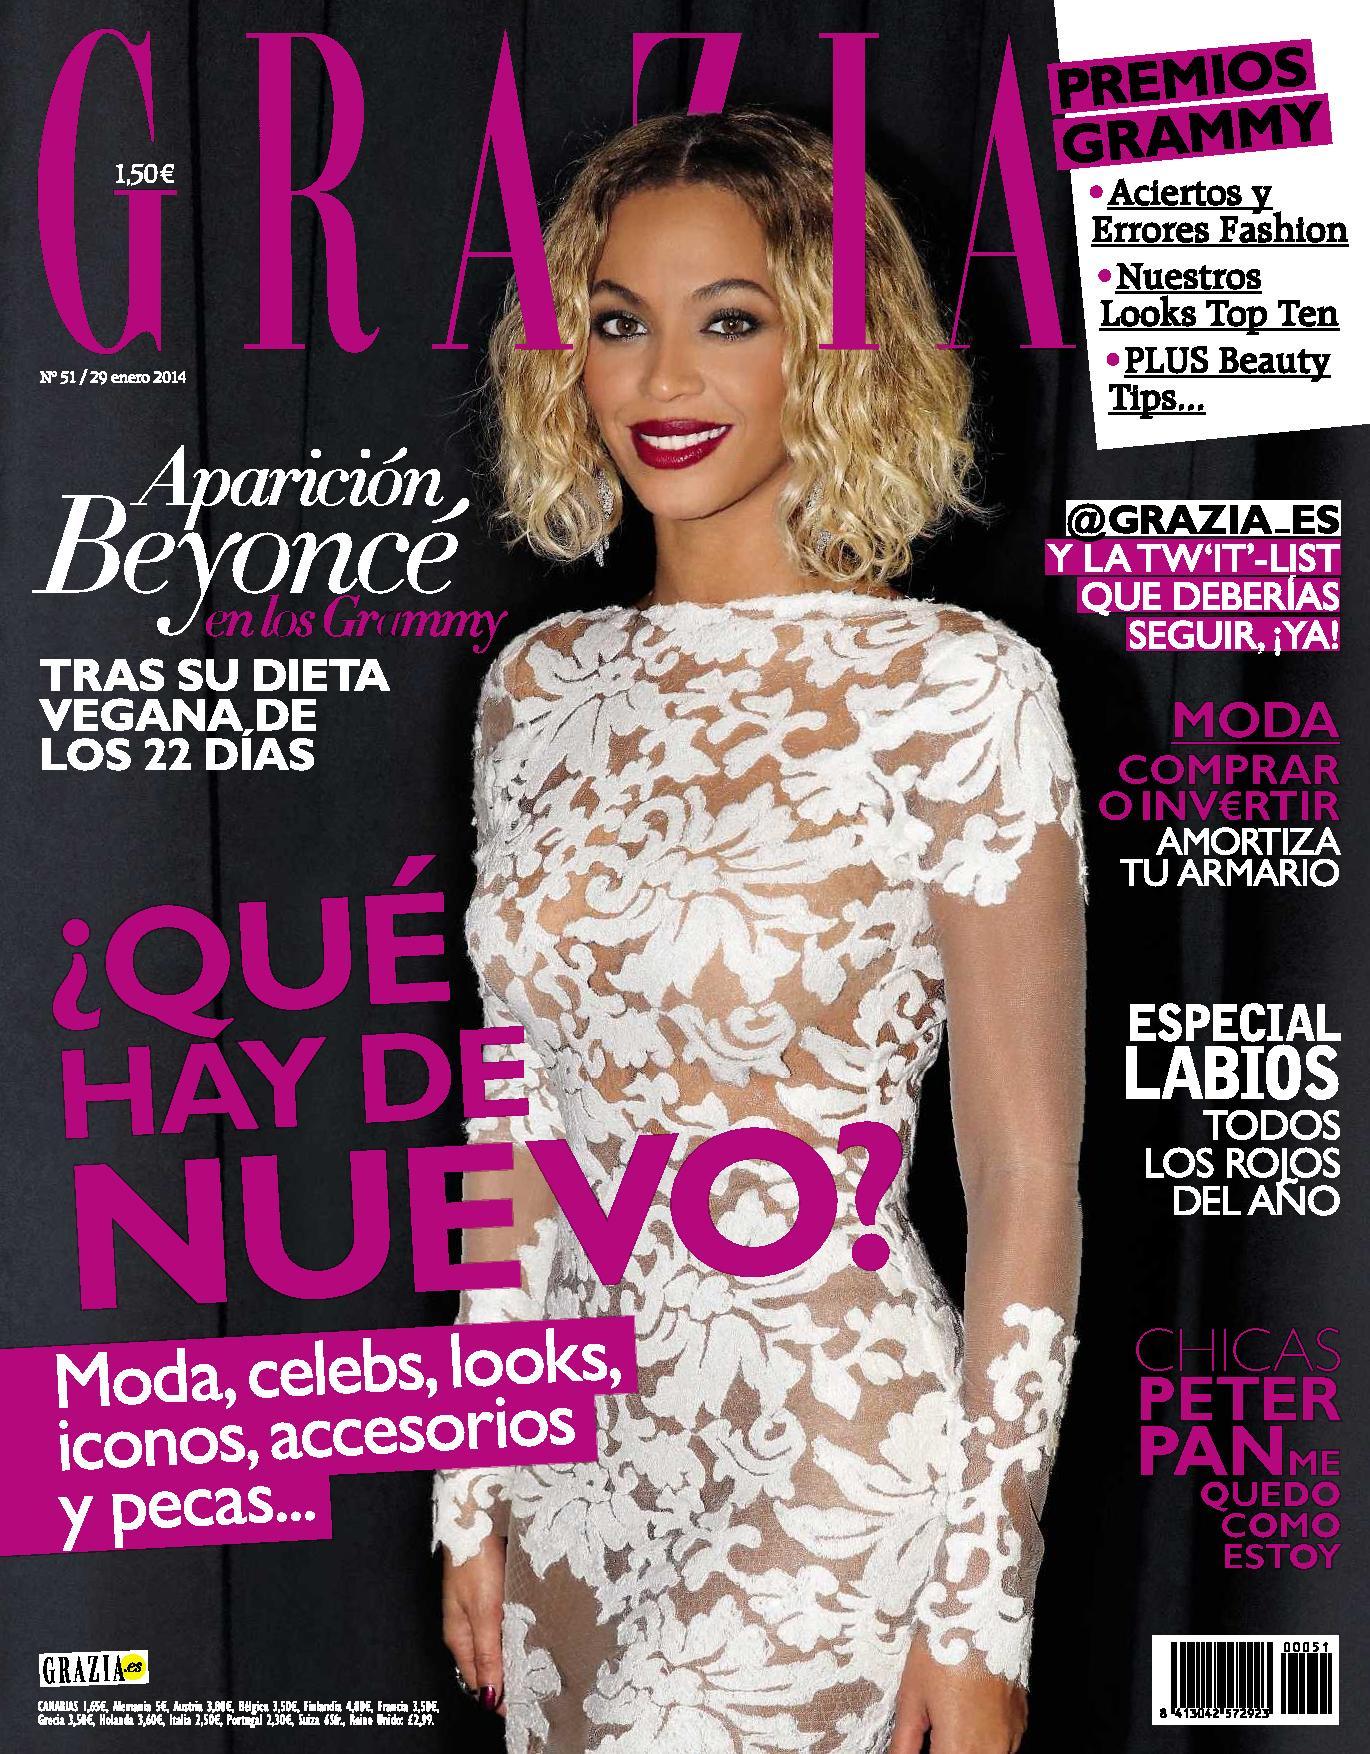 GRAZIA portada 29 de Enero 2014